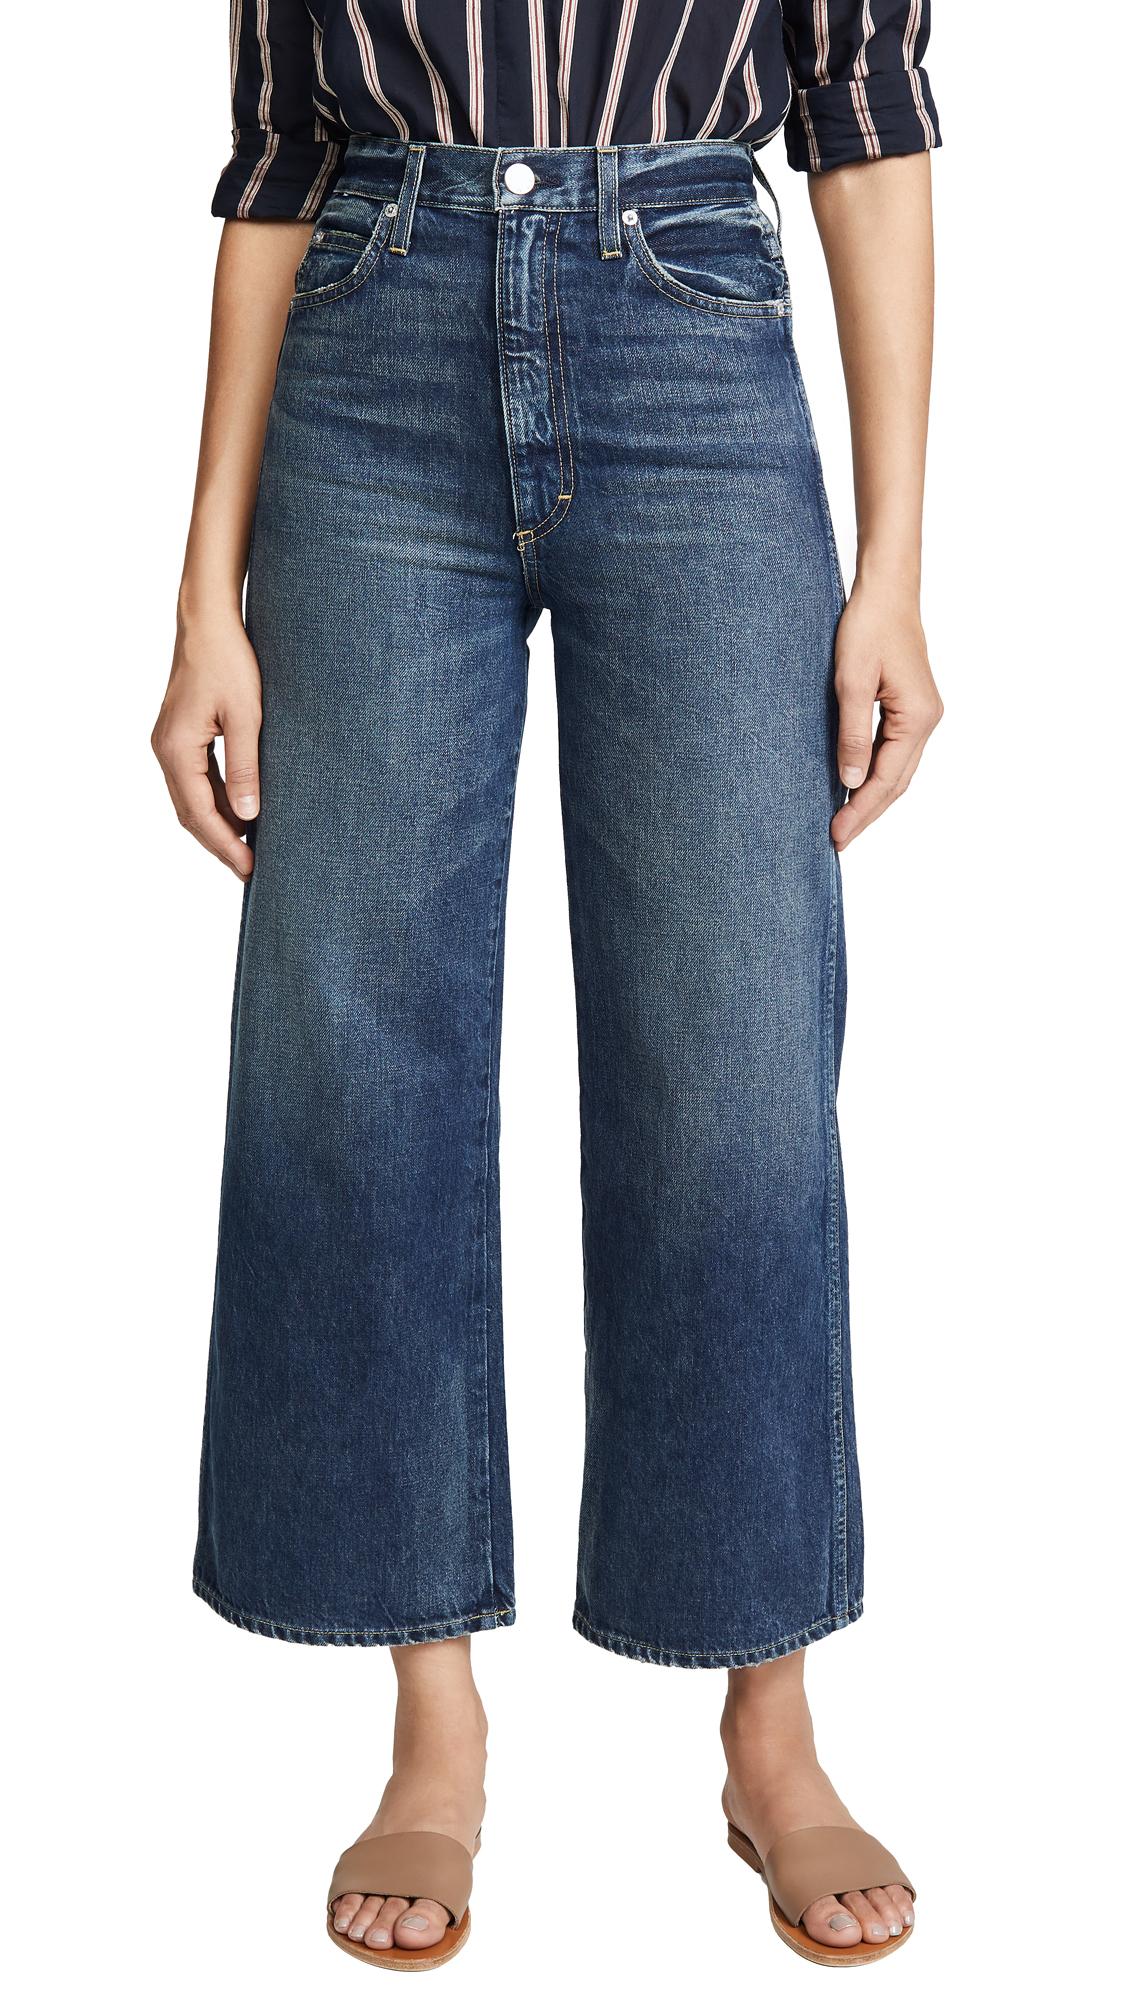 Ava Crop Wide Leg Jeans in 300 Cherish